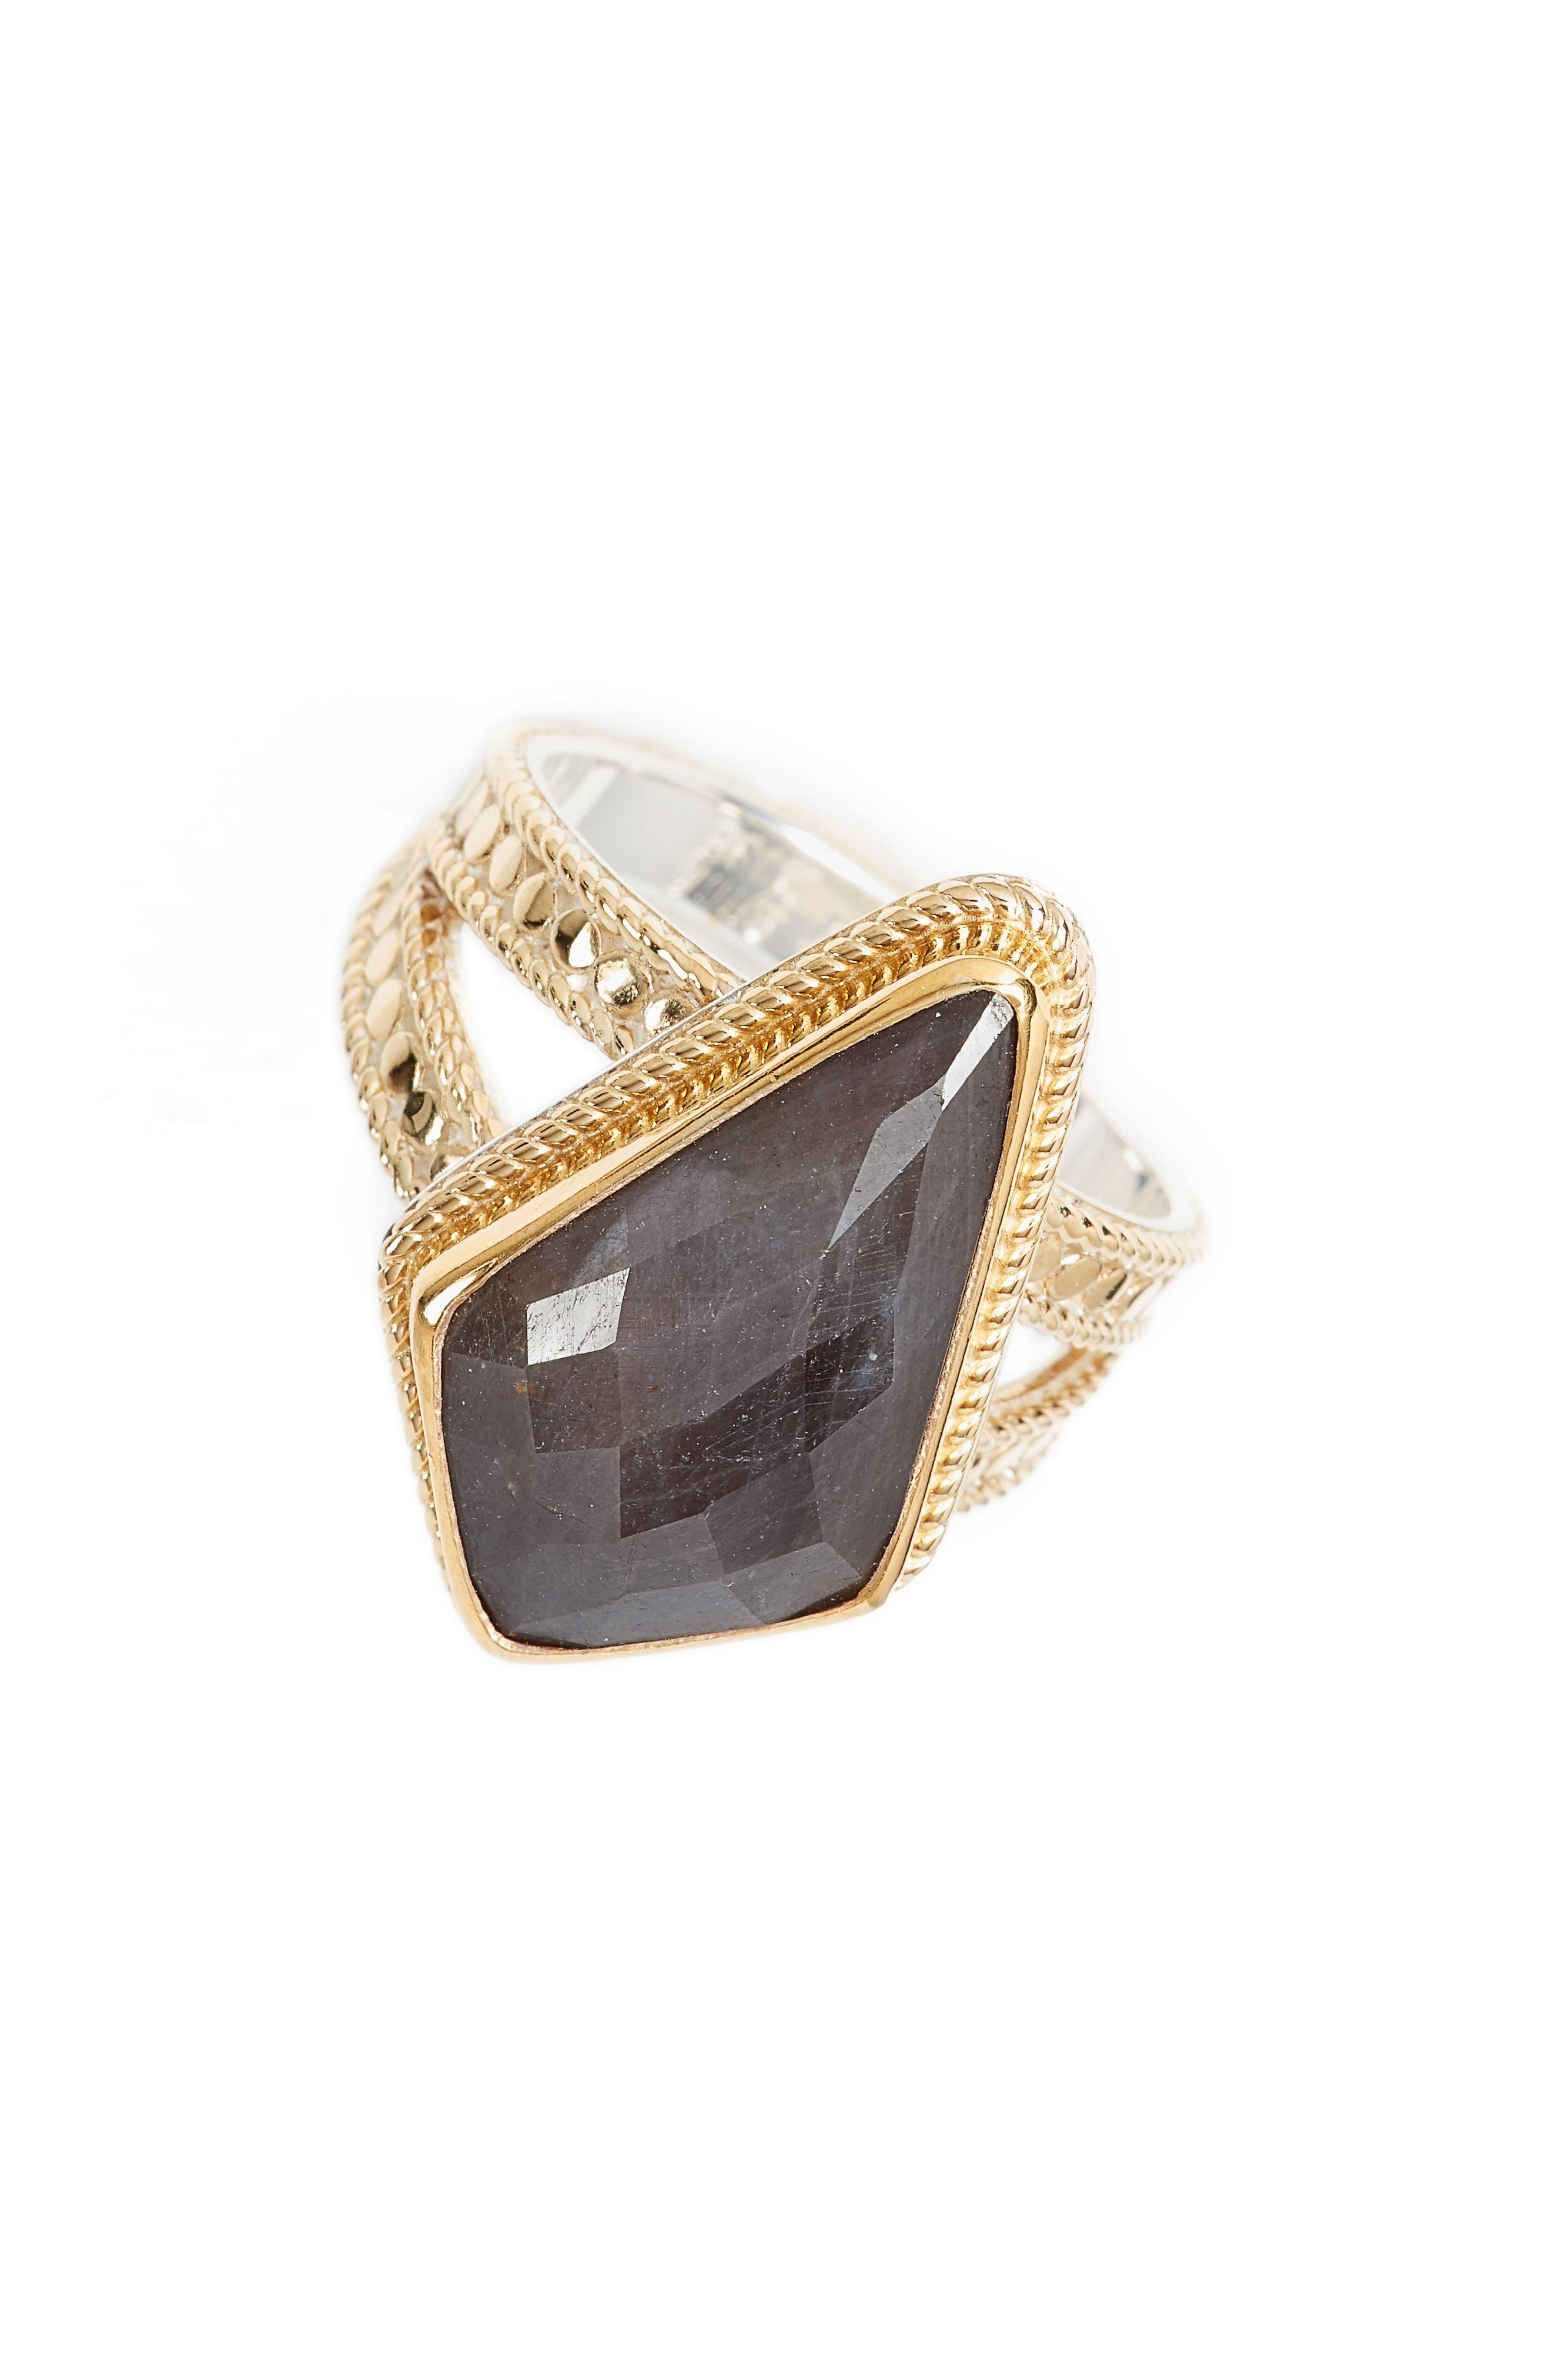 Grey Sapphire Kite Ring,                             Main thumbnail 1, color,                             020